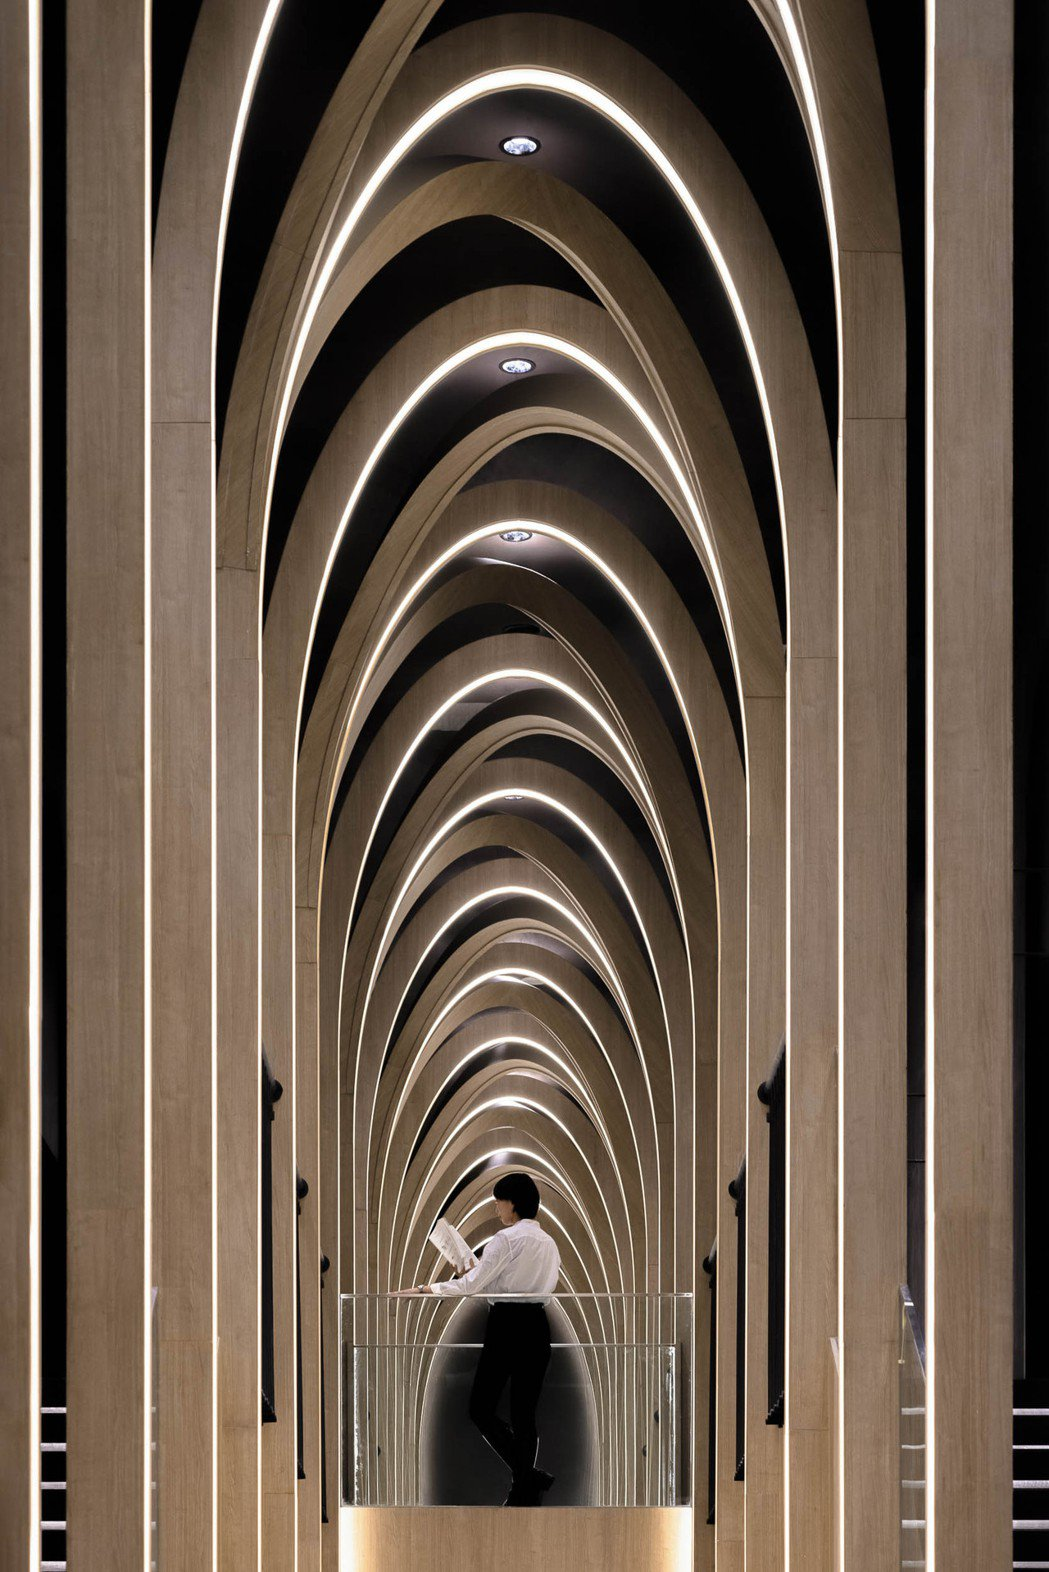 X+LIVING以挑高的設計,串連書店與影廳的步道,不規則拱門設計如同山峰綿延。...